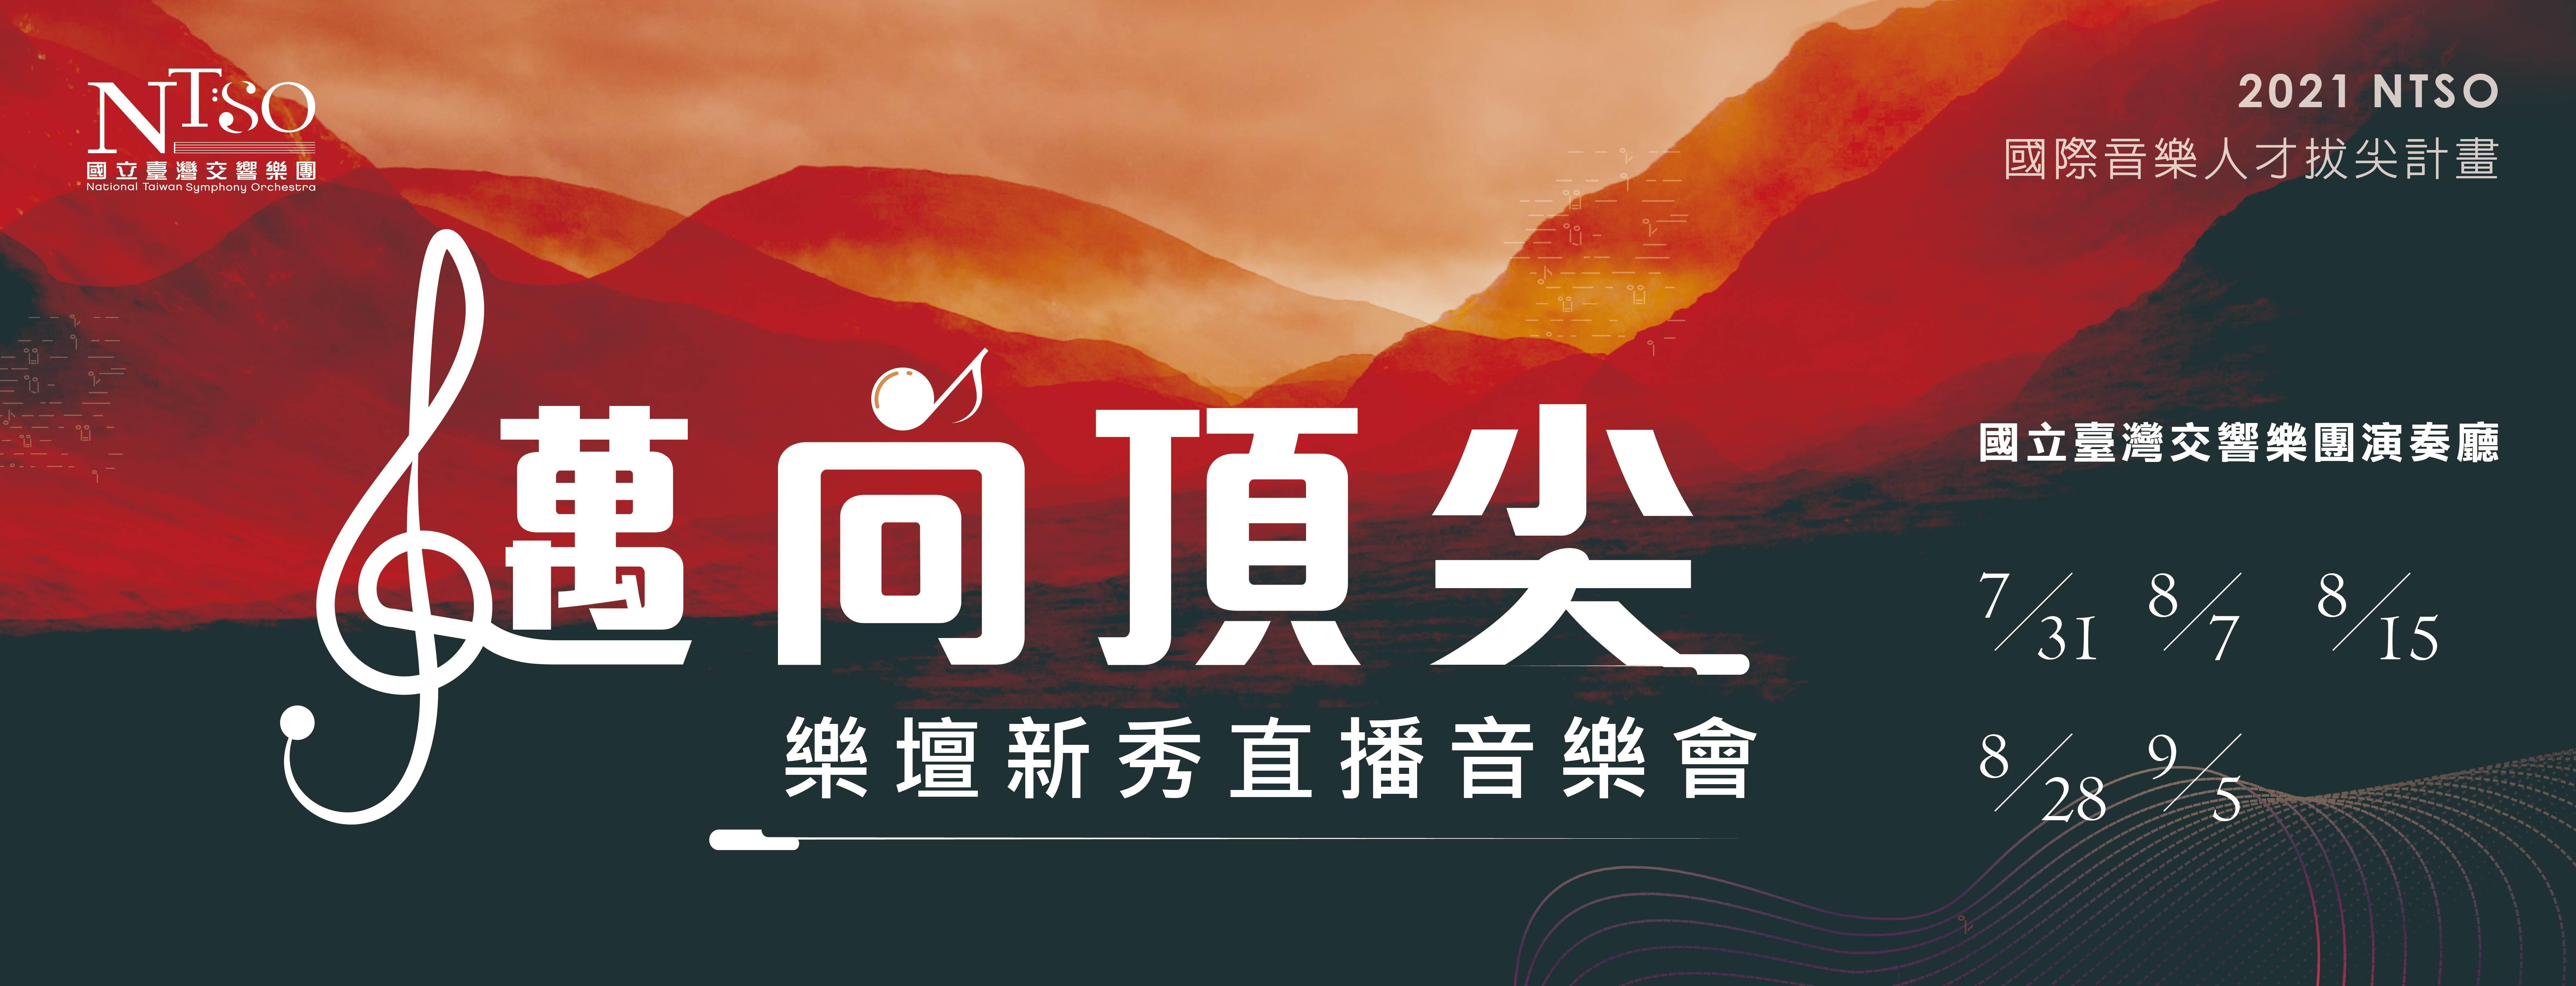 NTSO 2021《邁向頂尖》樂壇新秀音樂會